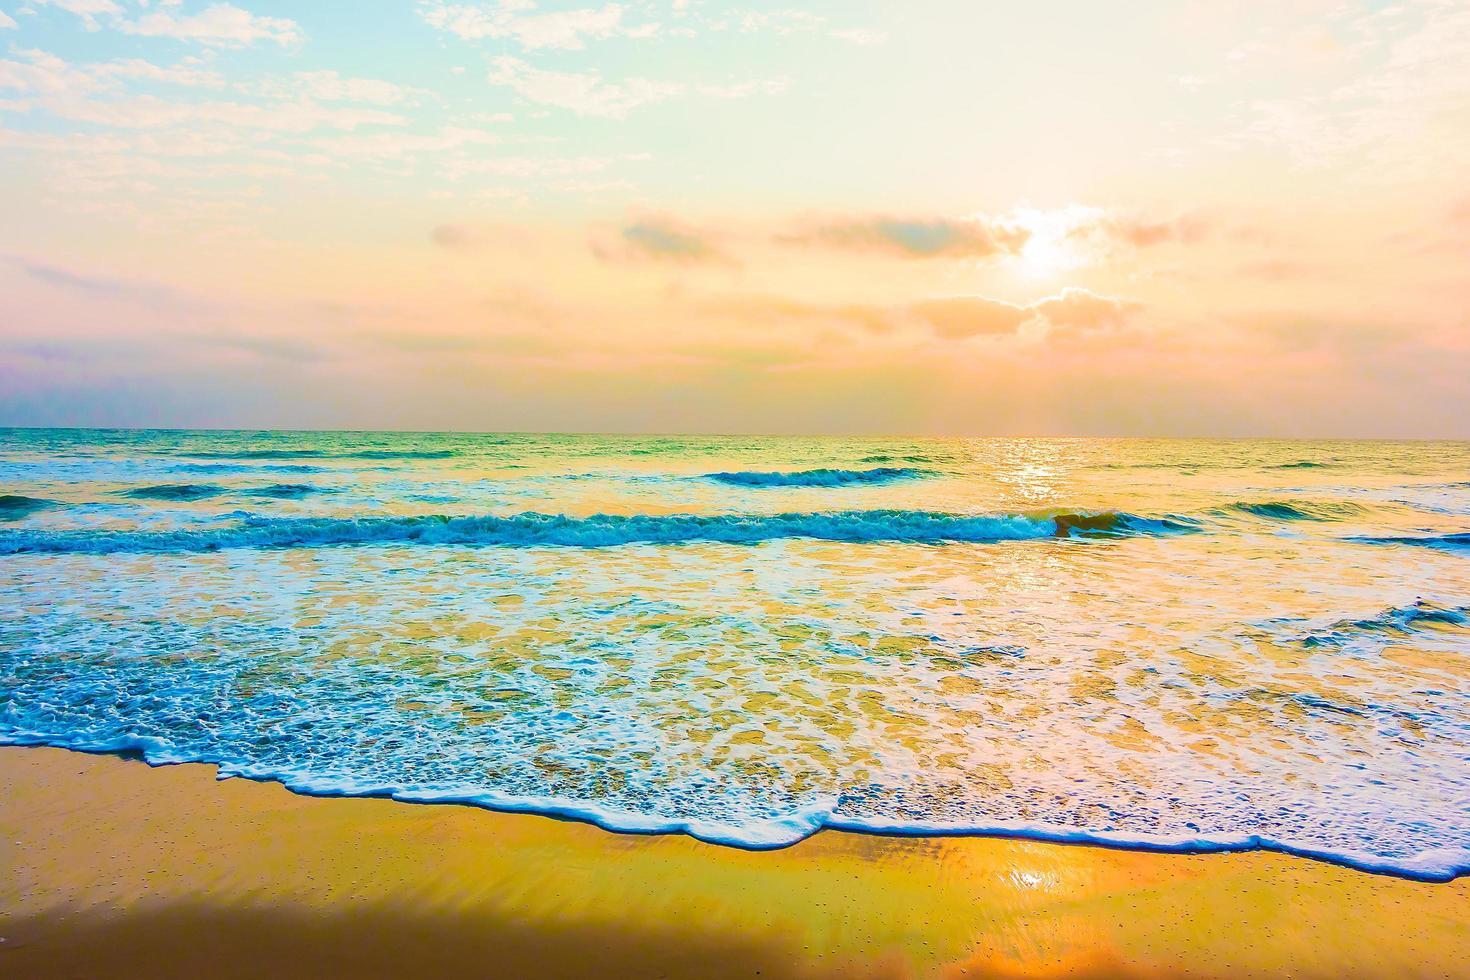 Sea and beach photo